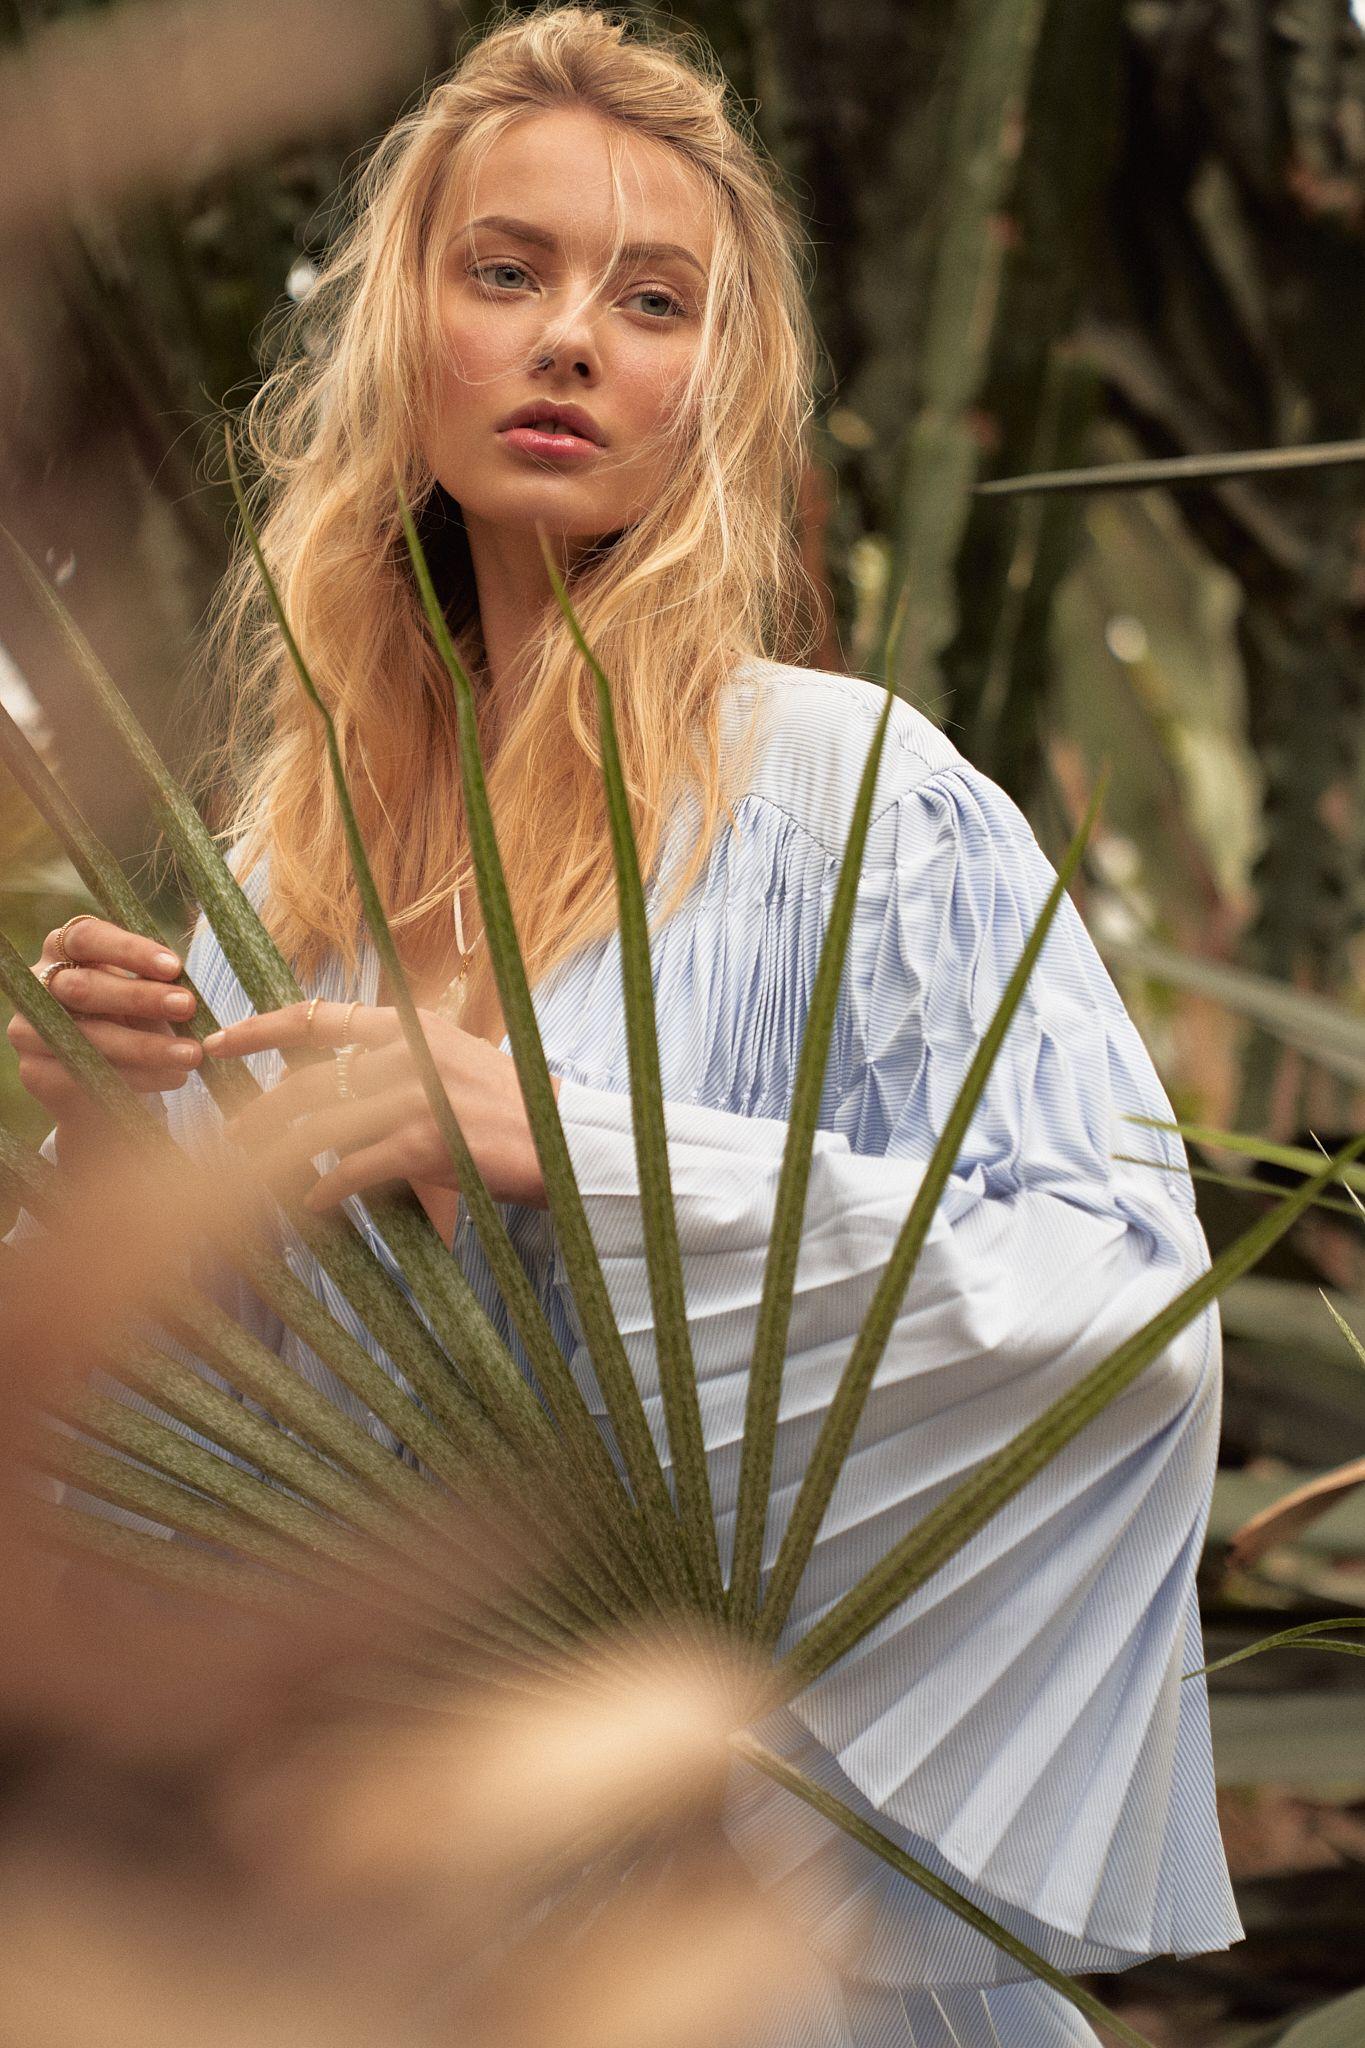 Garden of Eden - Solstice Magazine UK - Outtakes - Pic. 2